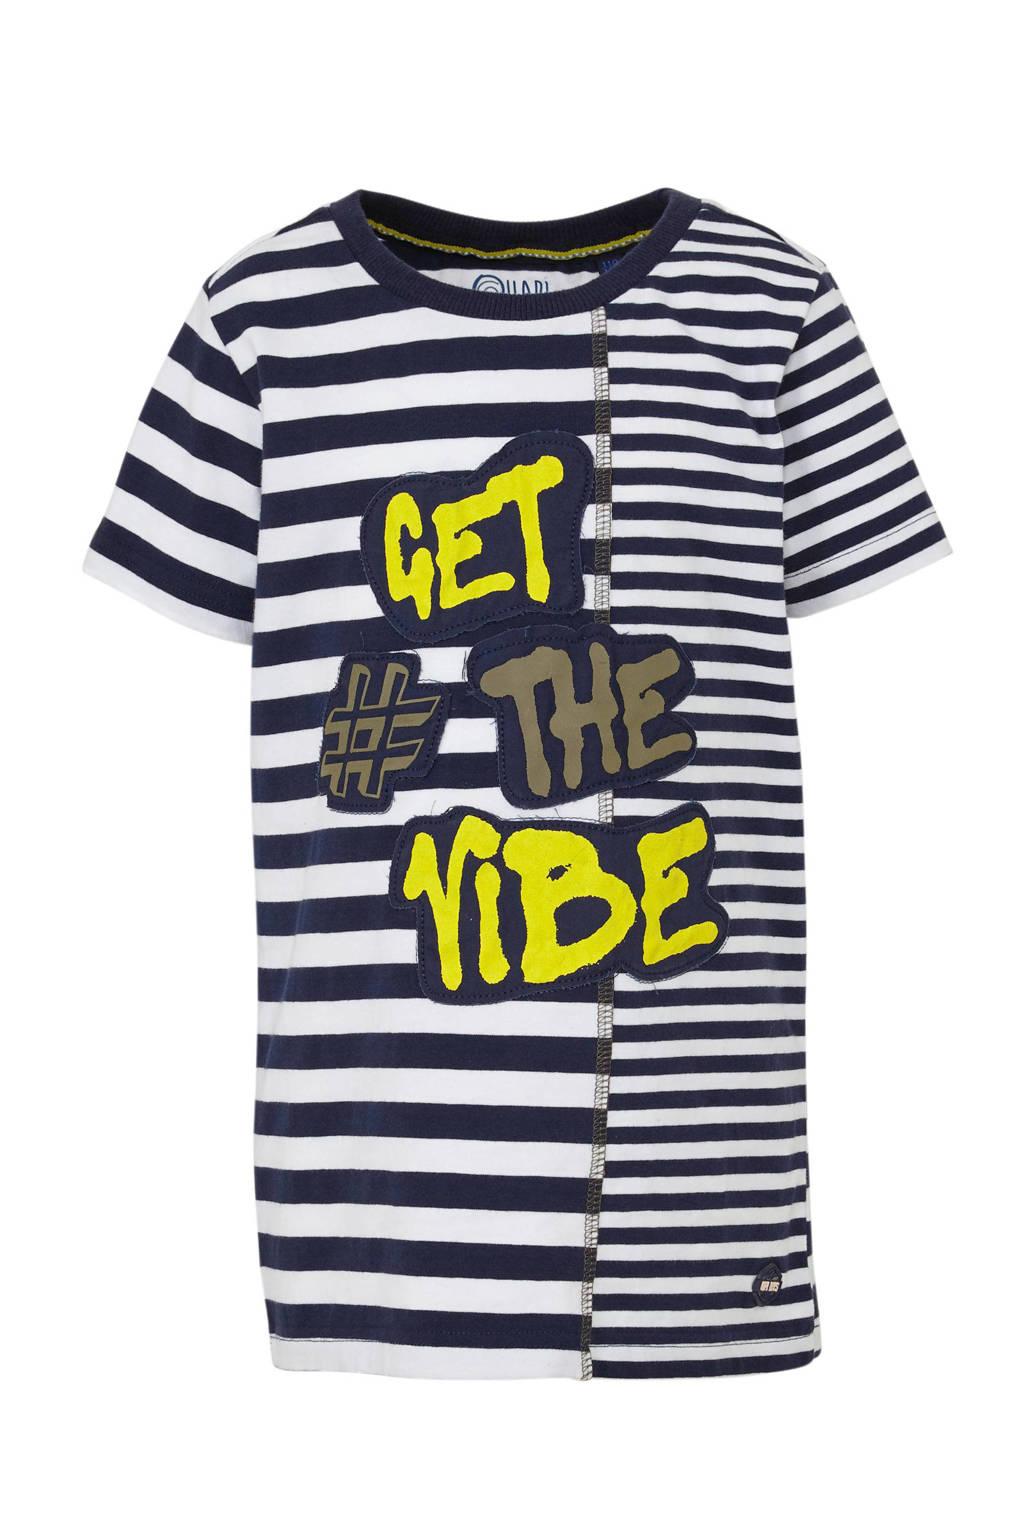 Quapi gestreept T-shirt Aaron donkerblauw/wit/geel, Donkerblauw/wit/geel